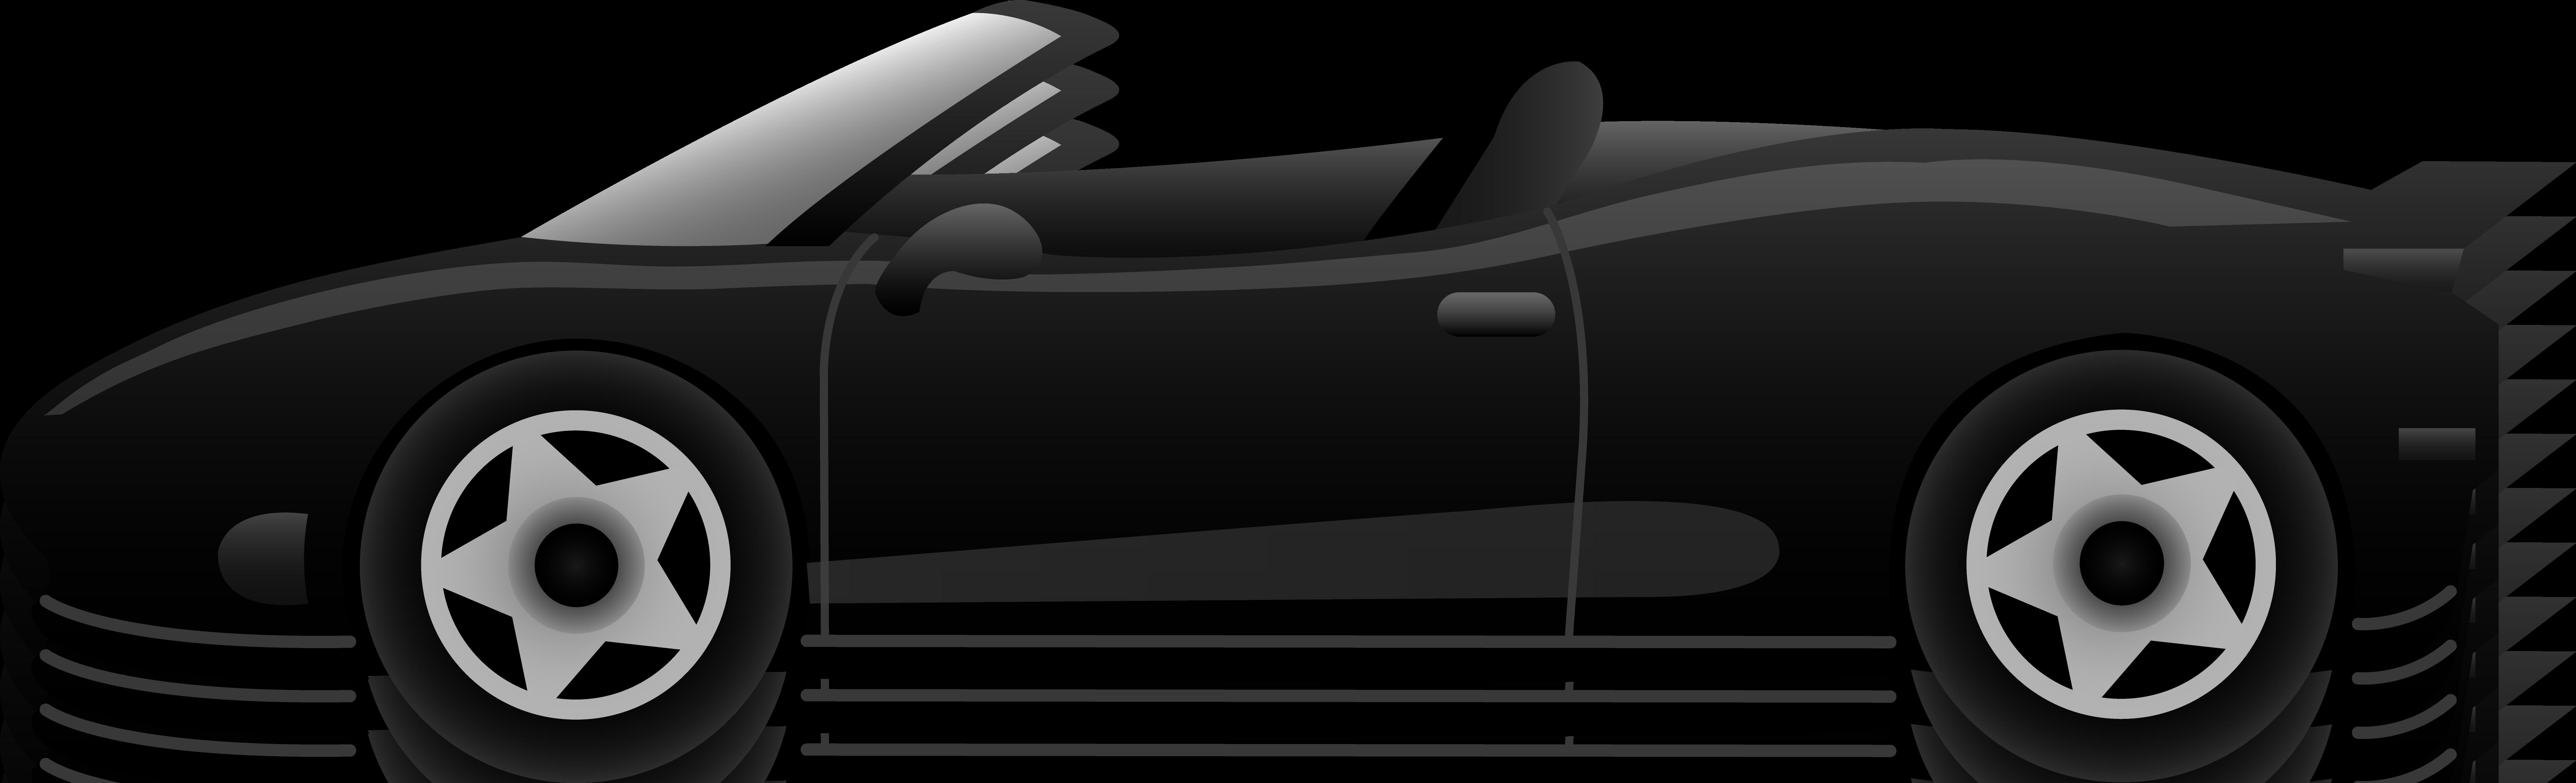 7863x2391 Cartoon Sports Car